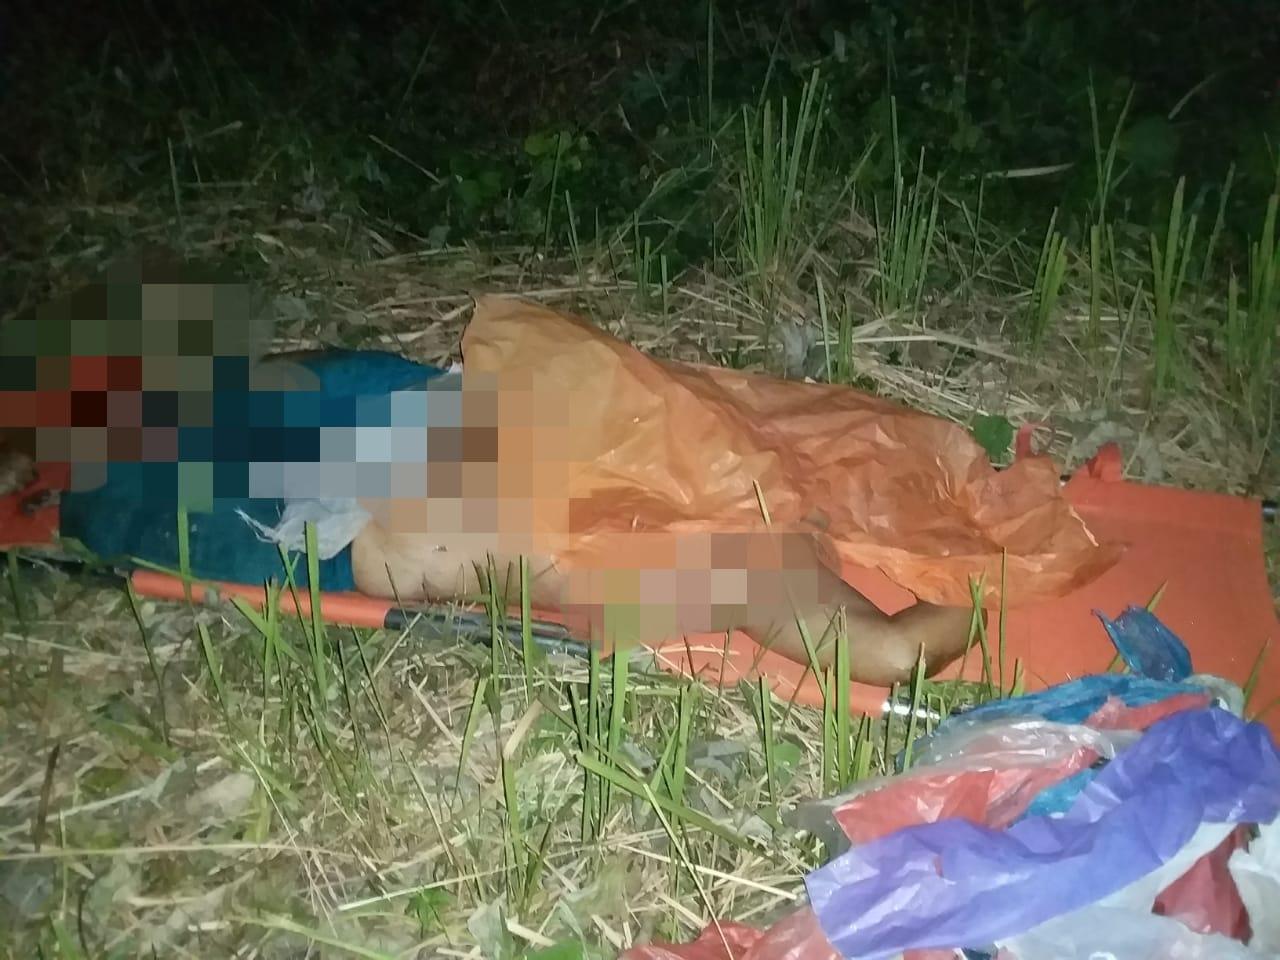 Wanita Tanpa Identitas Tertabrak Kereta Api di Perlintasan Rel Batang Kuis-Bandar Khalipah